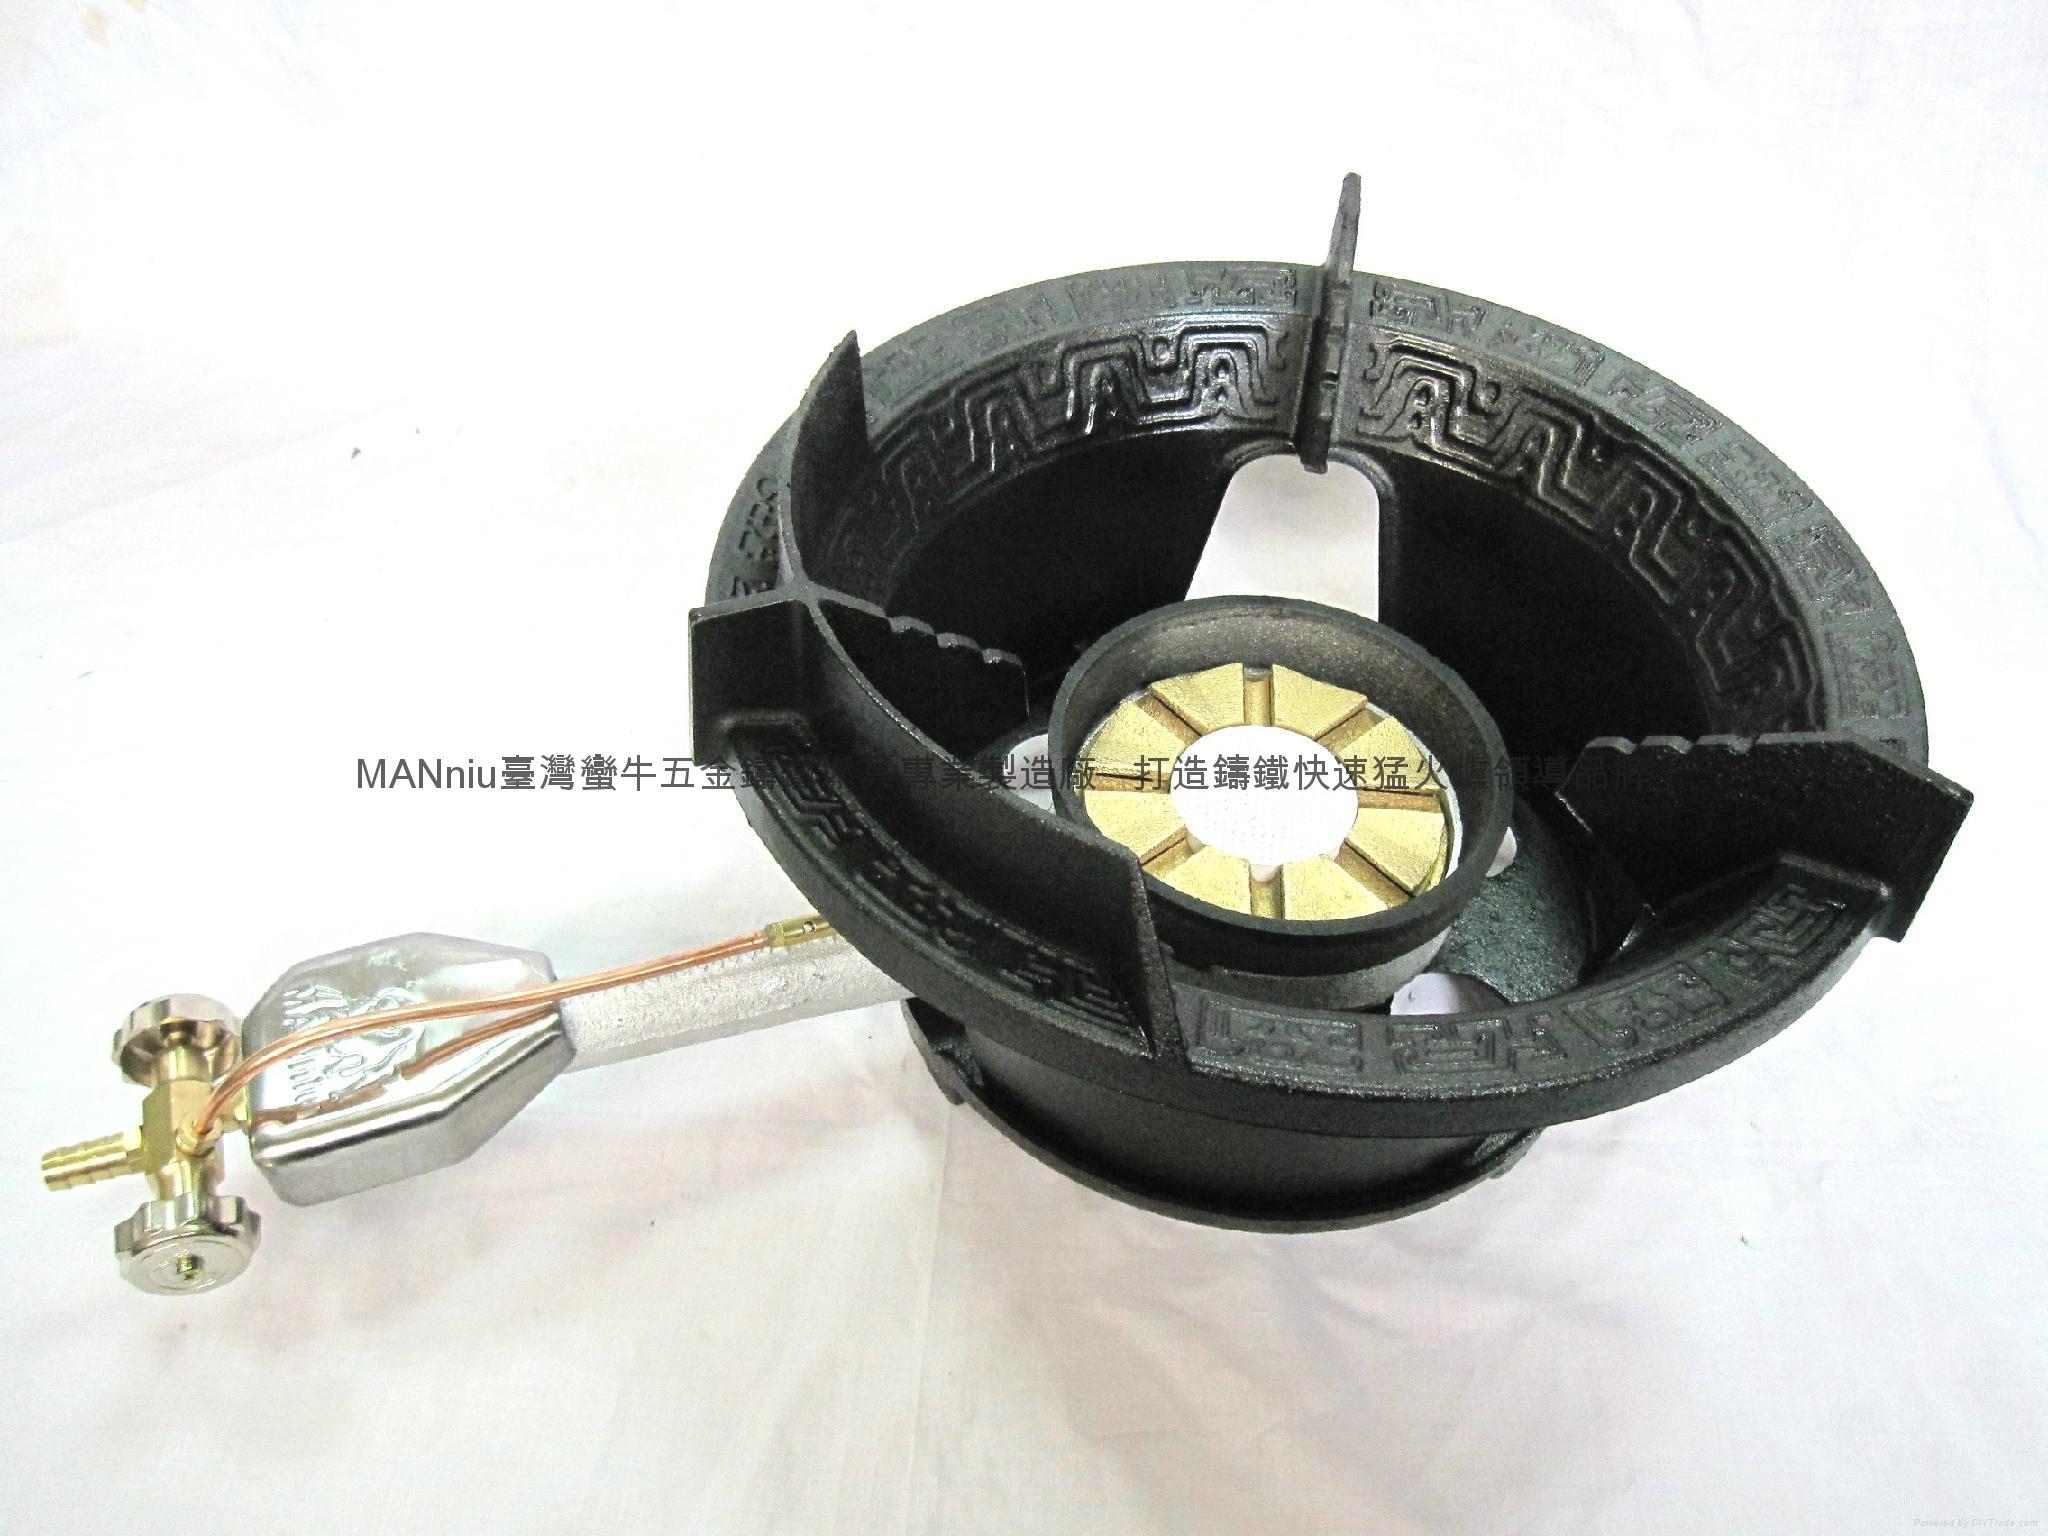 XG32  IR+Fry all-in-1 iron gas burners 1